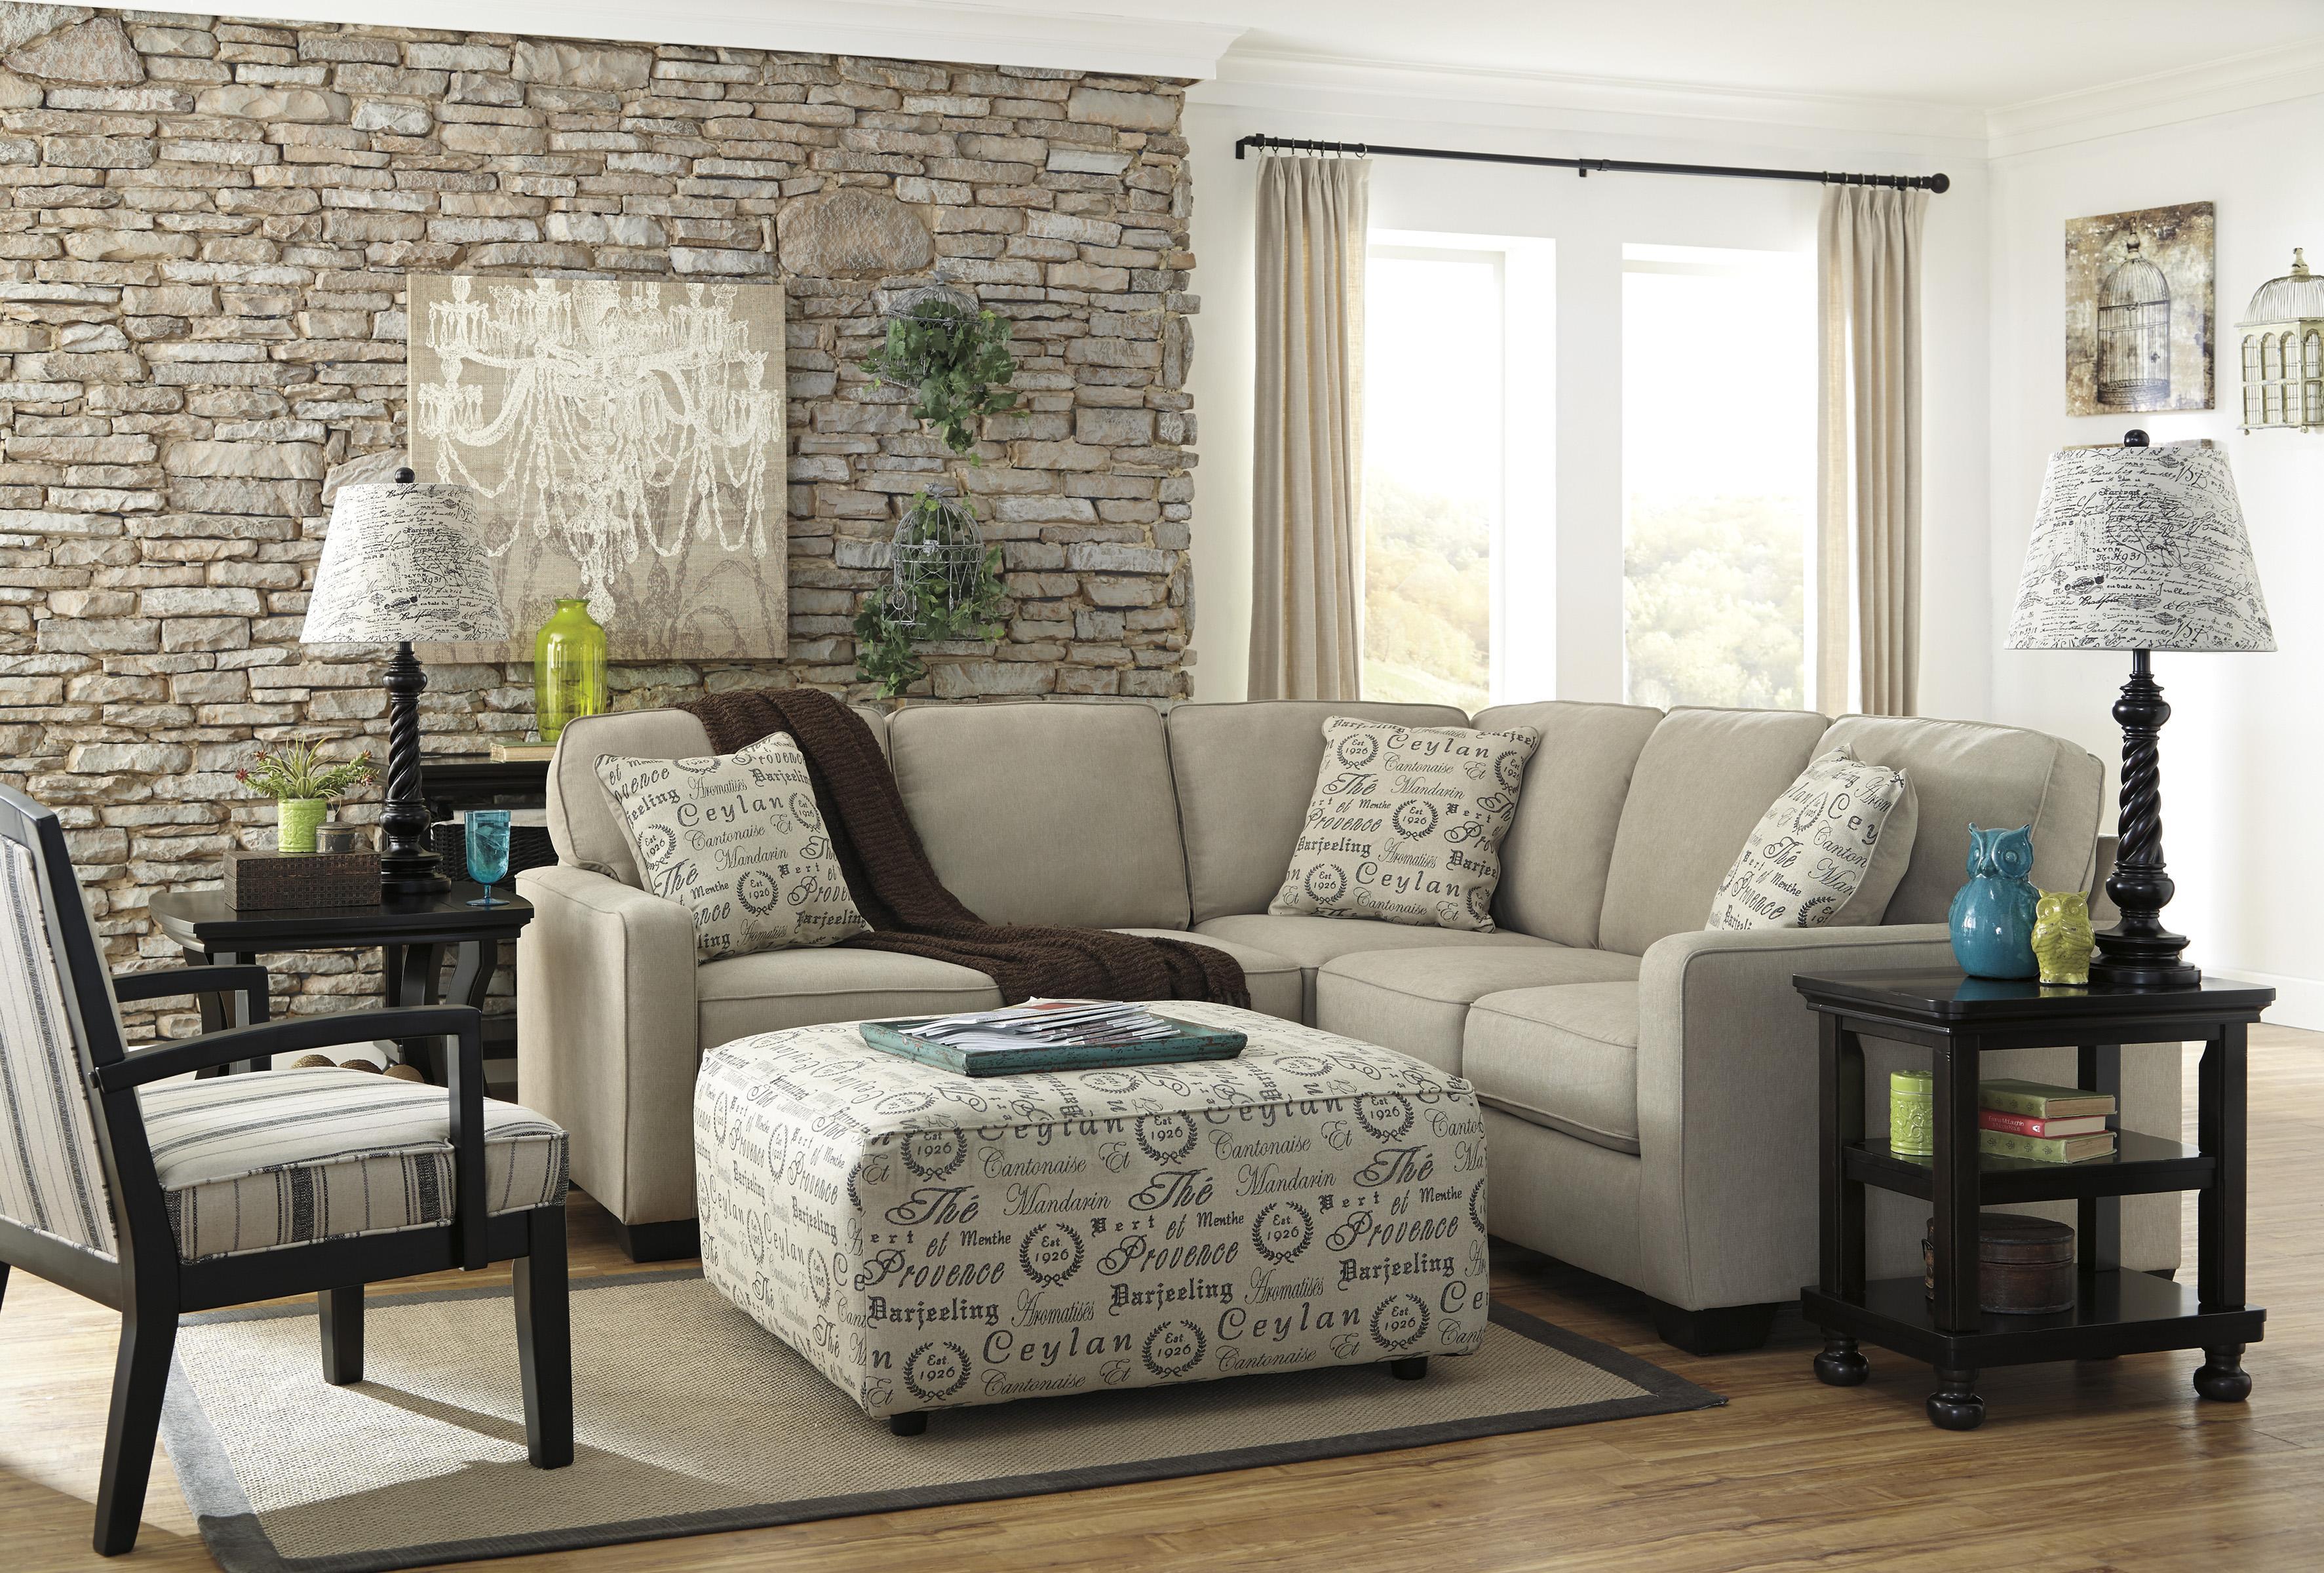 Signature Design by Ashley Furniture Alenya - Quartz Stationary Living Room Group - Item Number: 16600 Living Room Group 11